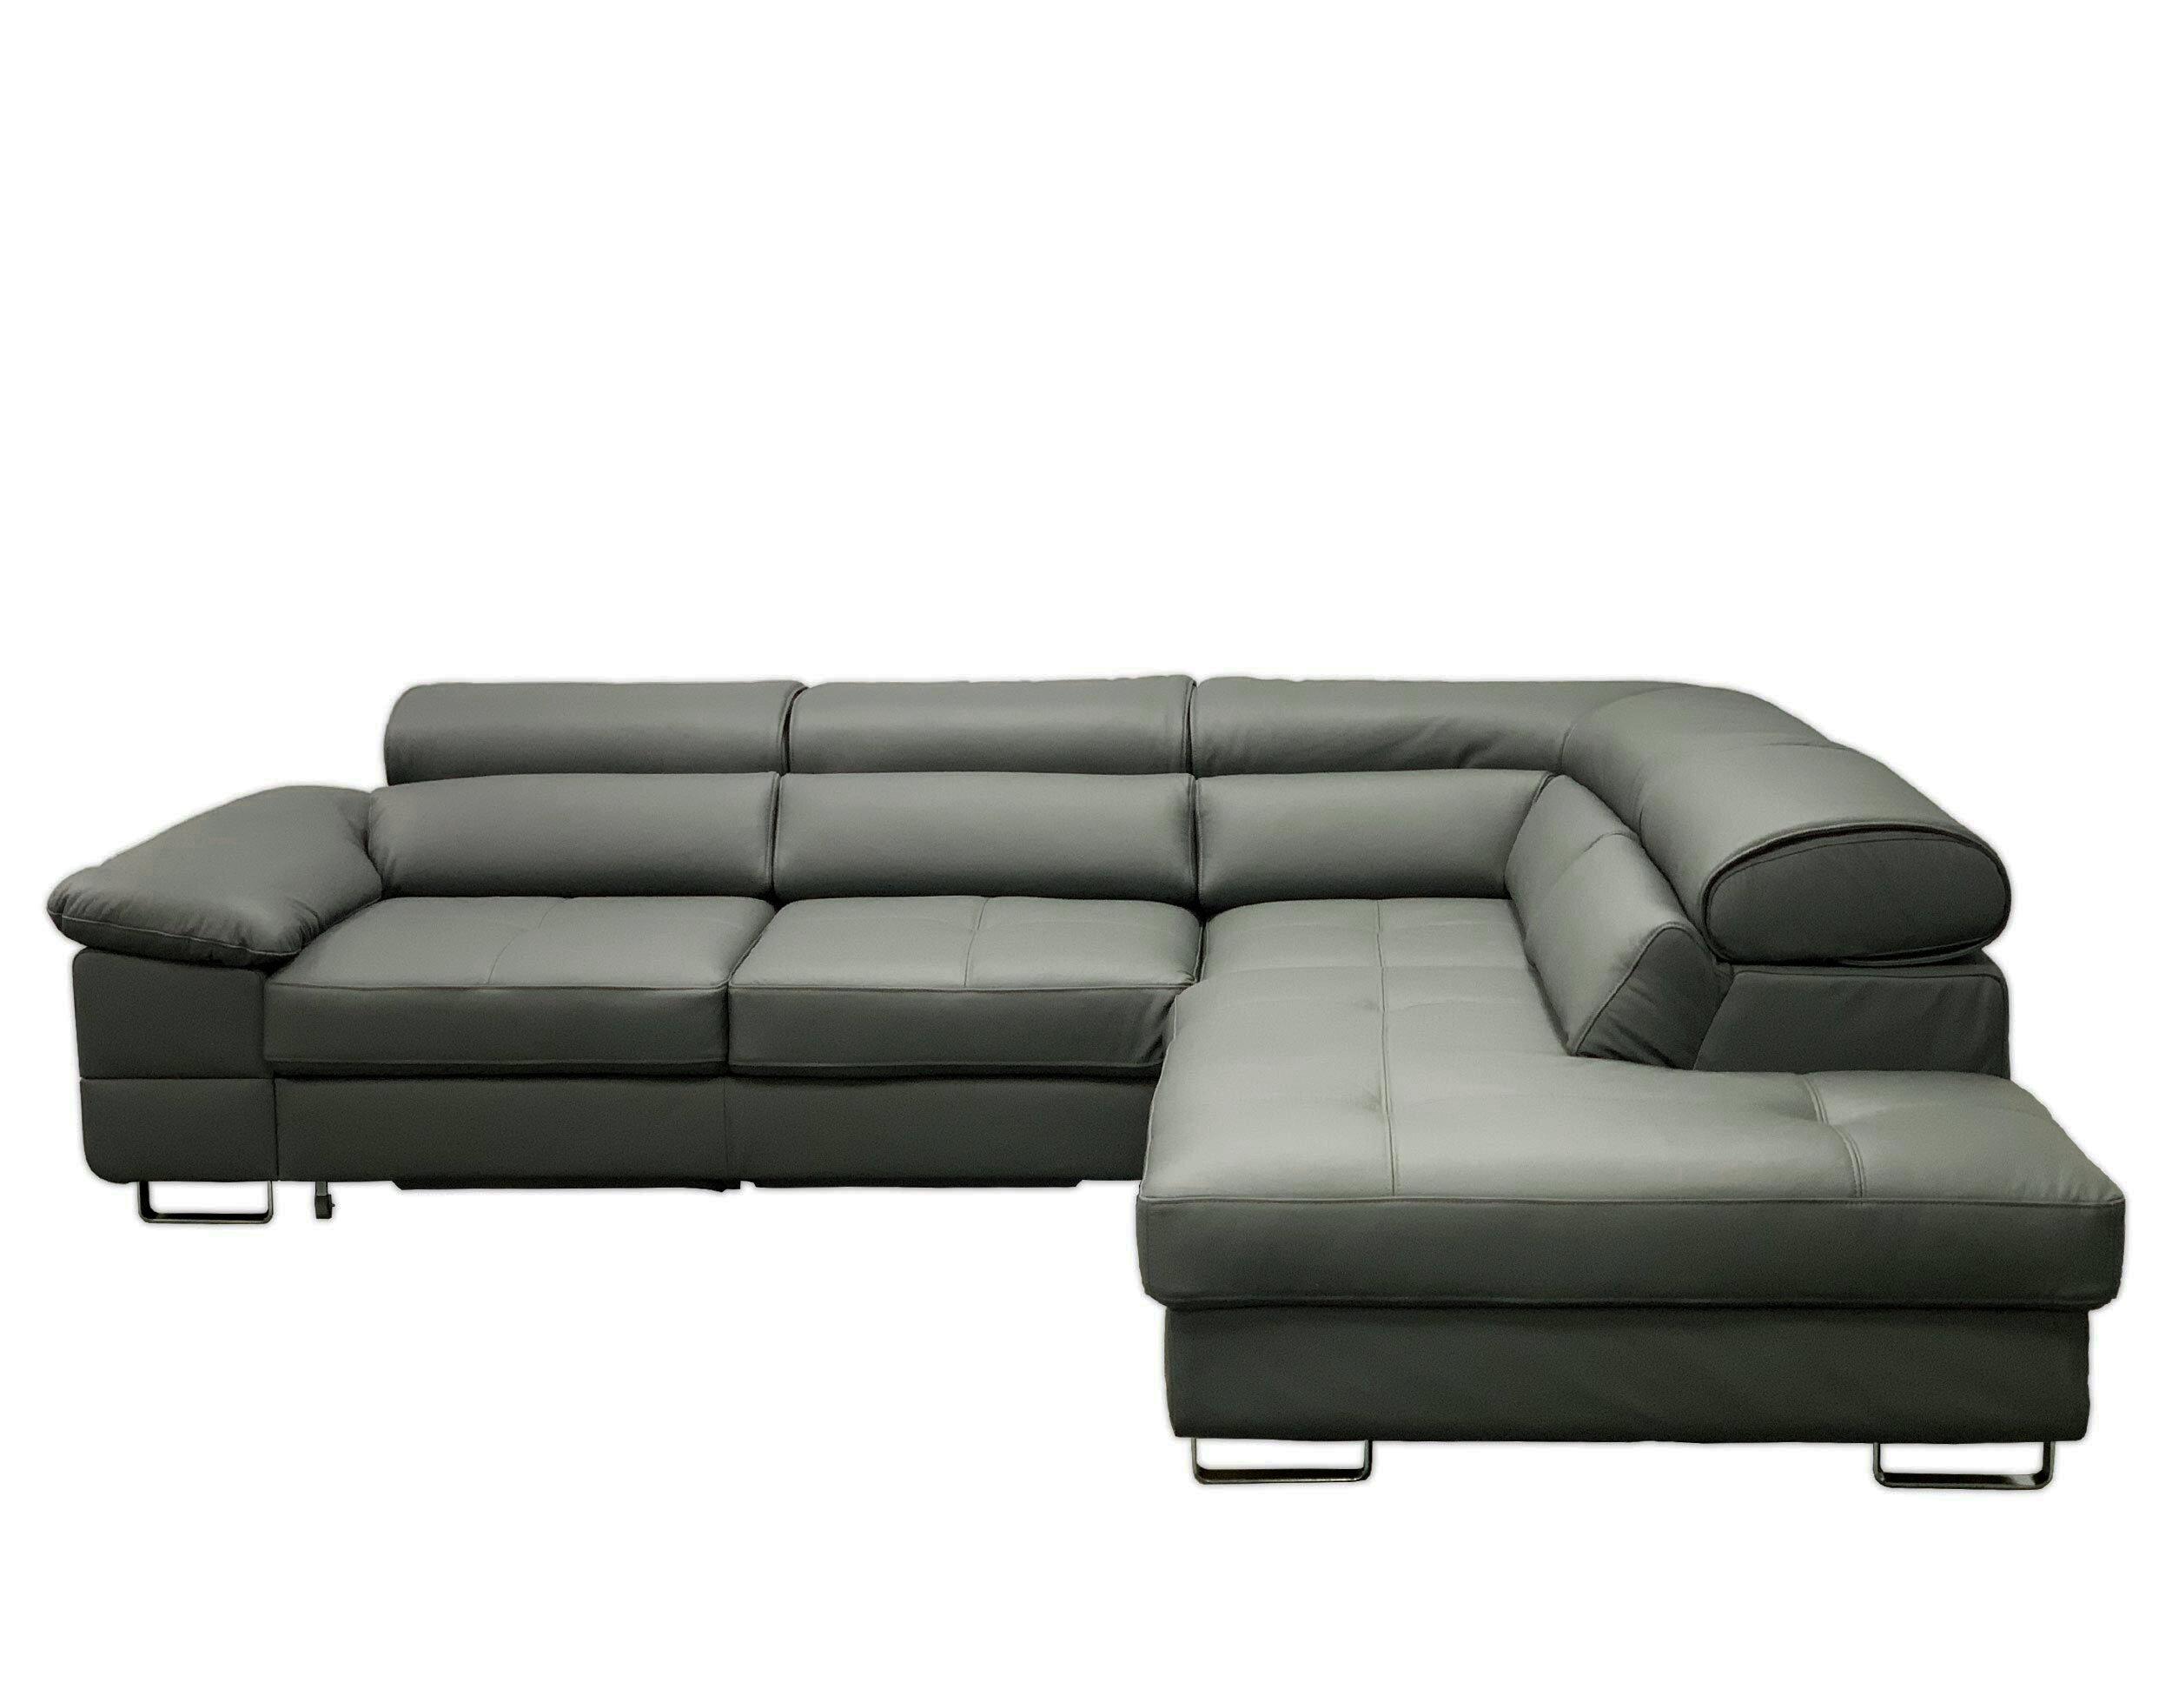 Vvrhomes Costa Leather Sectional Sleeper Sofa